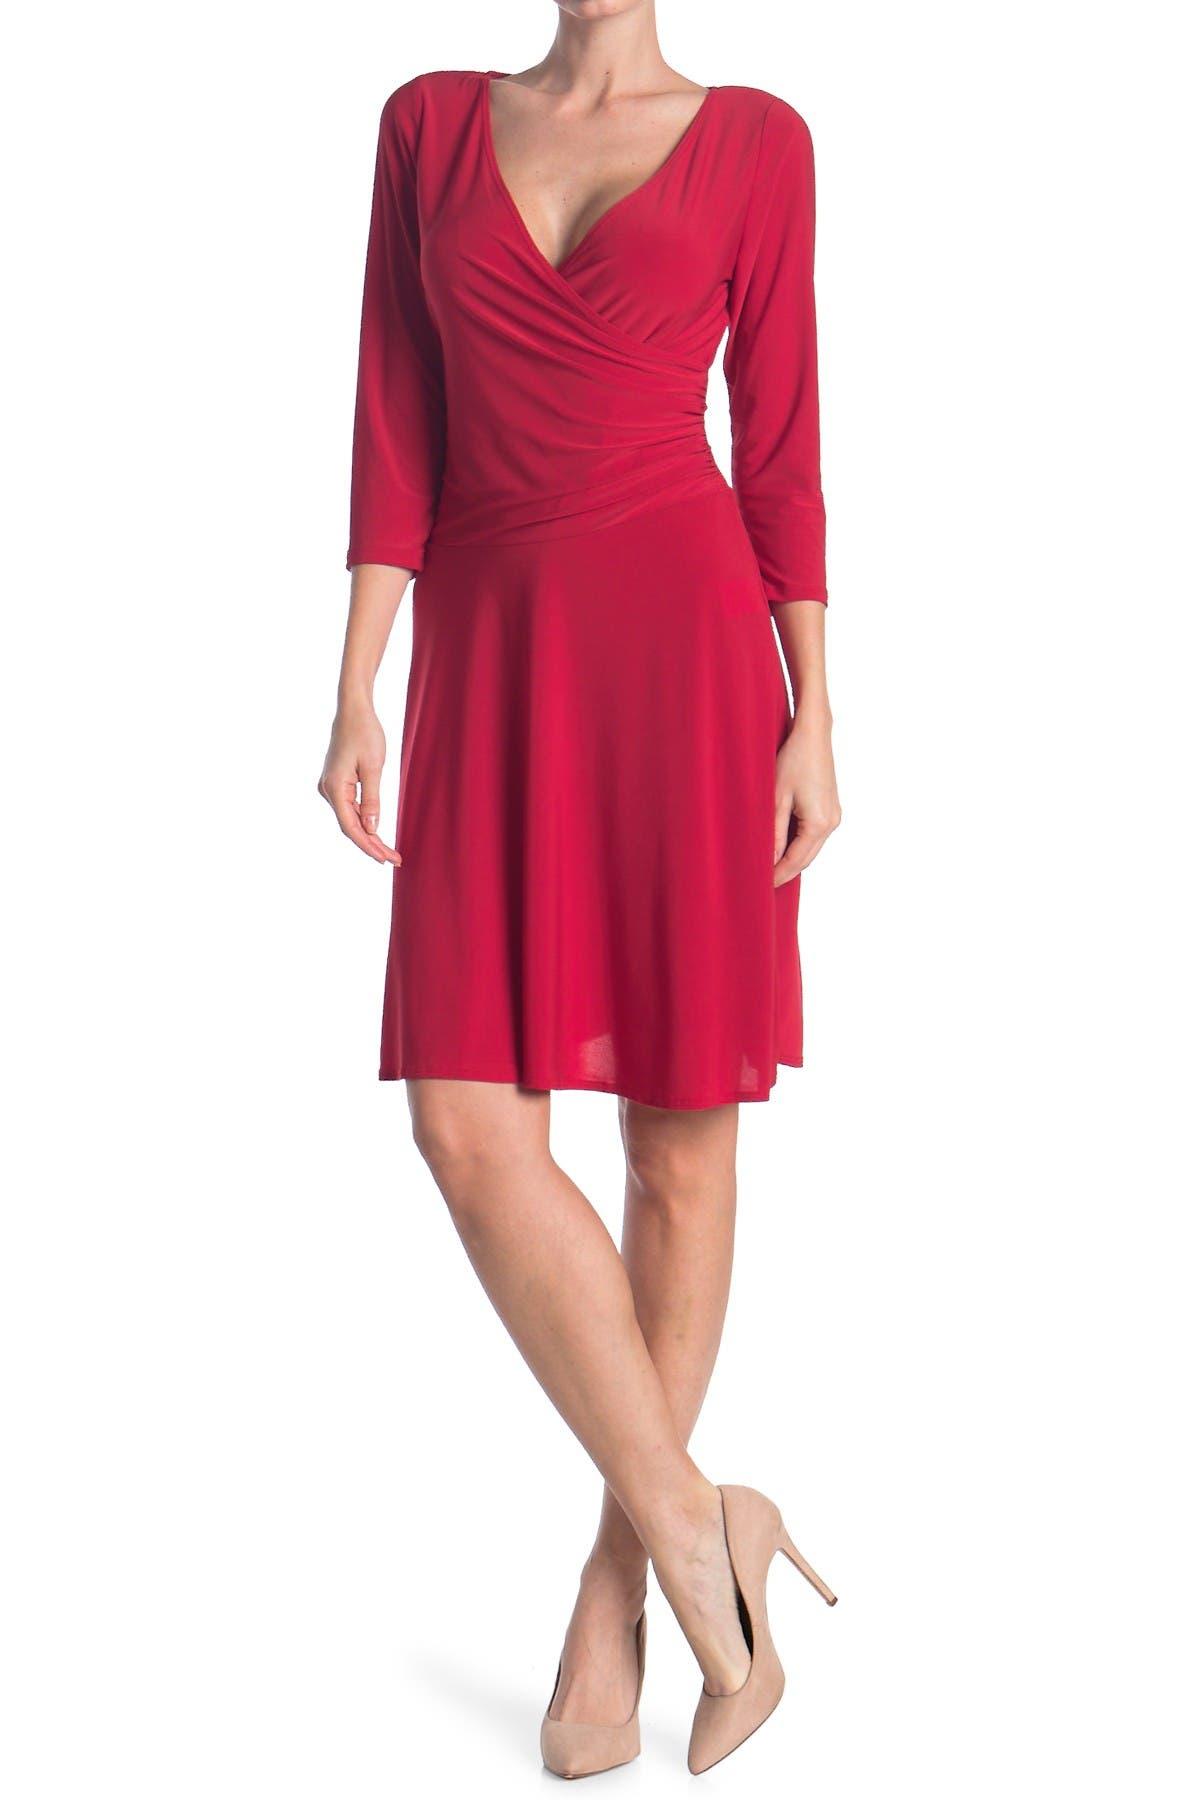 Image of TASH + SOPHIE Long Sleeve Wrap Dress